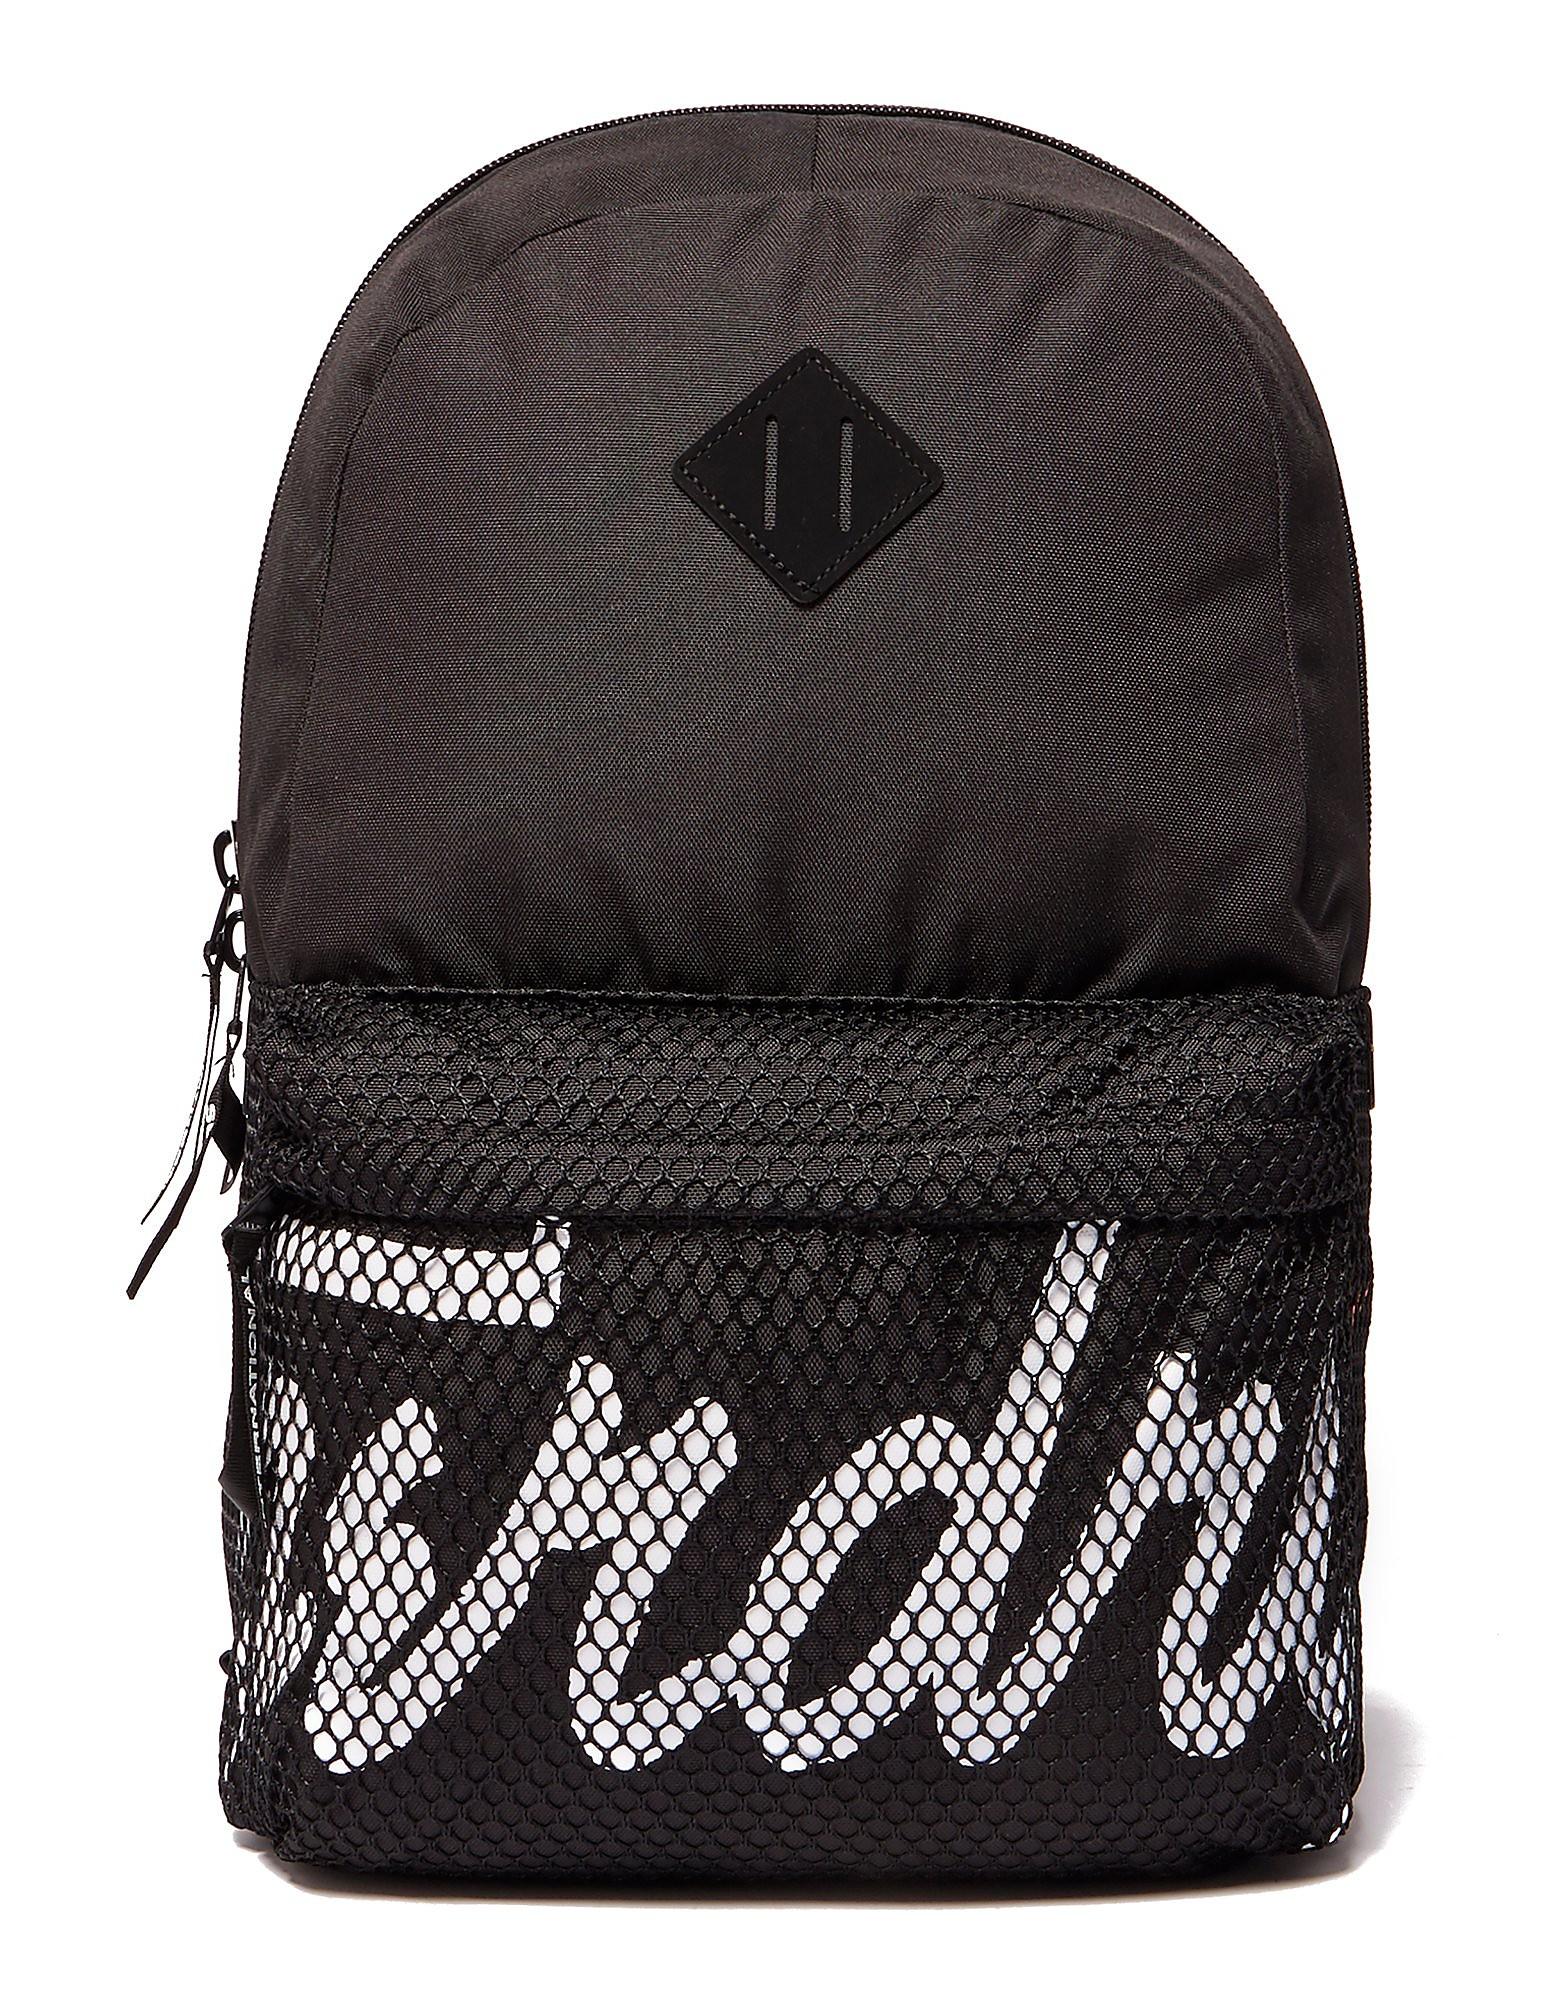 Superdry Mesh Montana Backpack